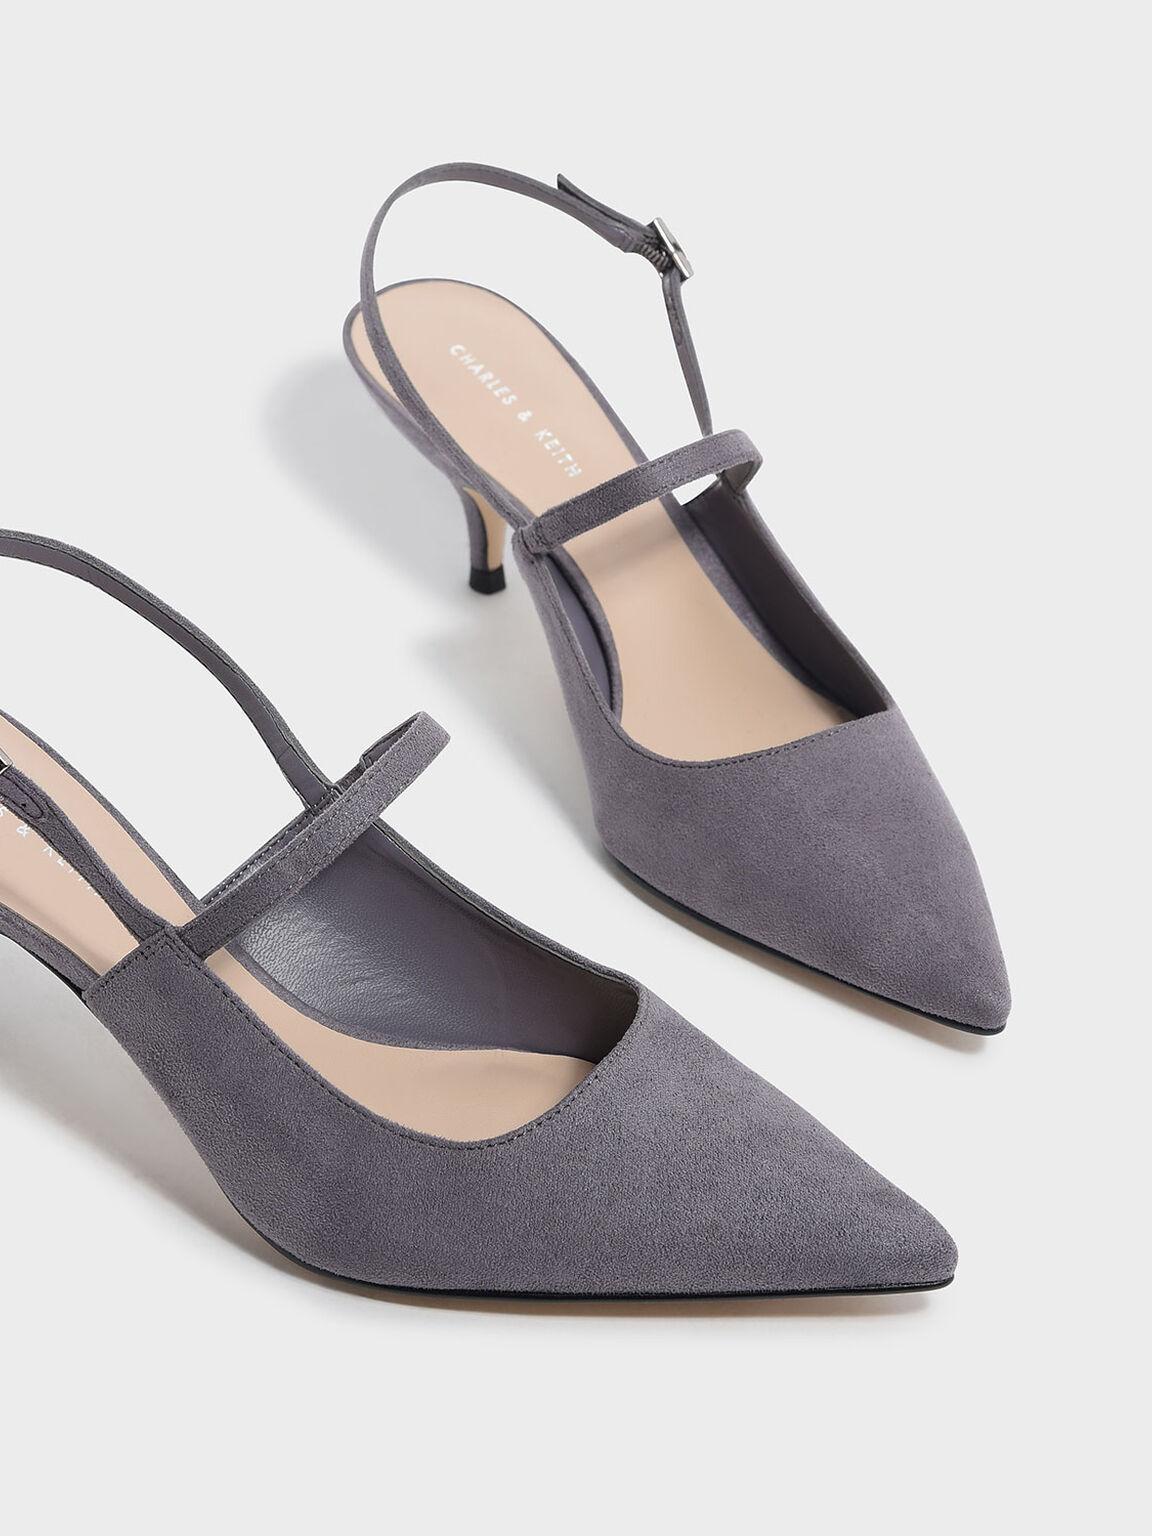 Slingback Kitten Heels, Grey, hi-res